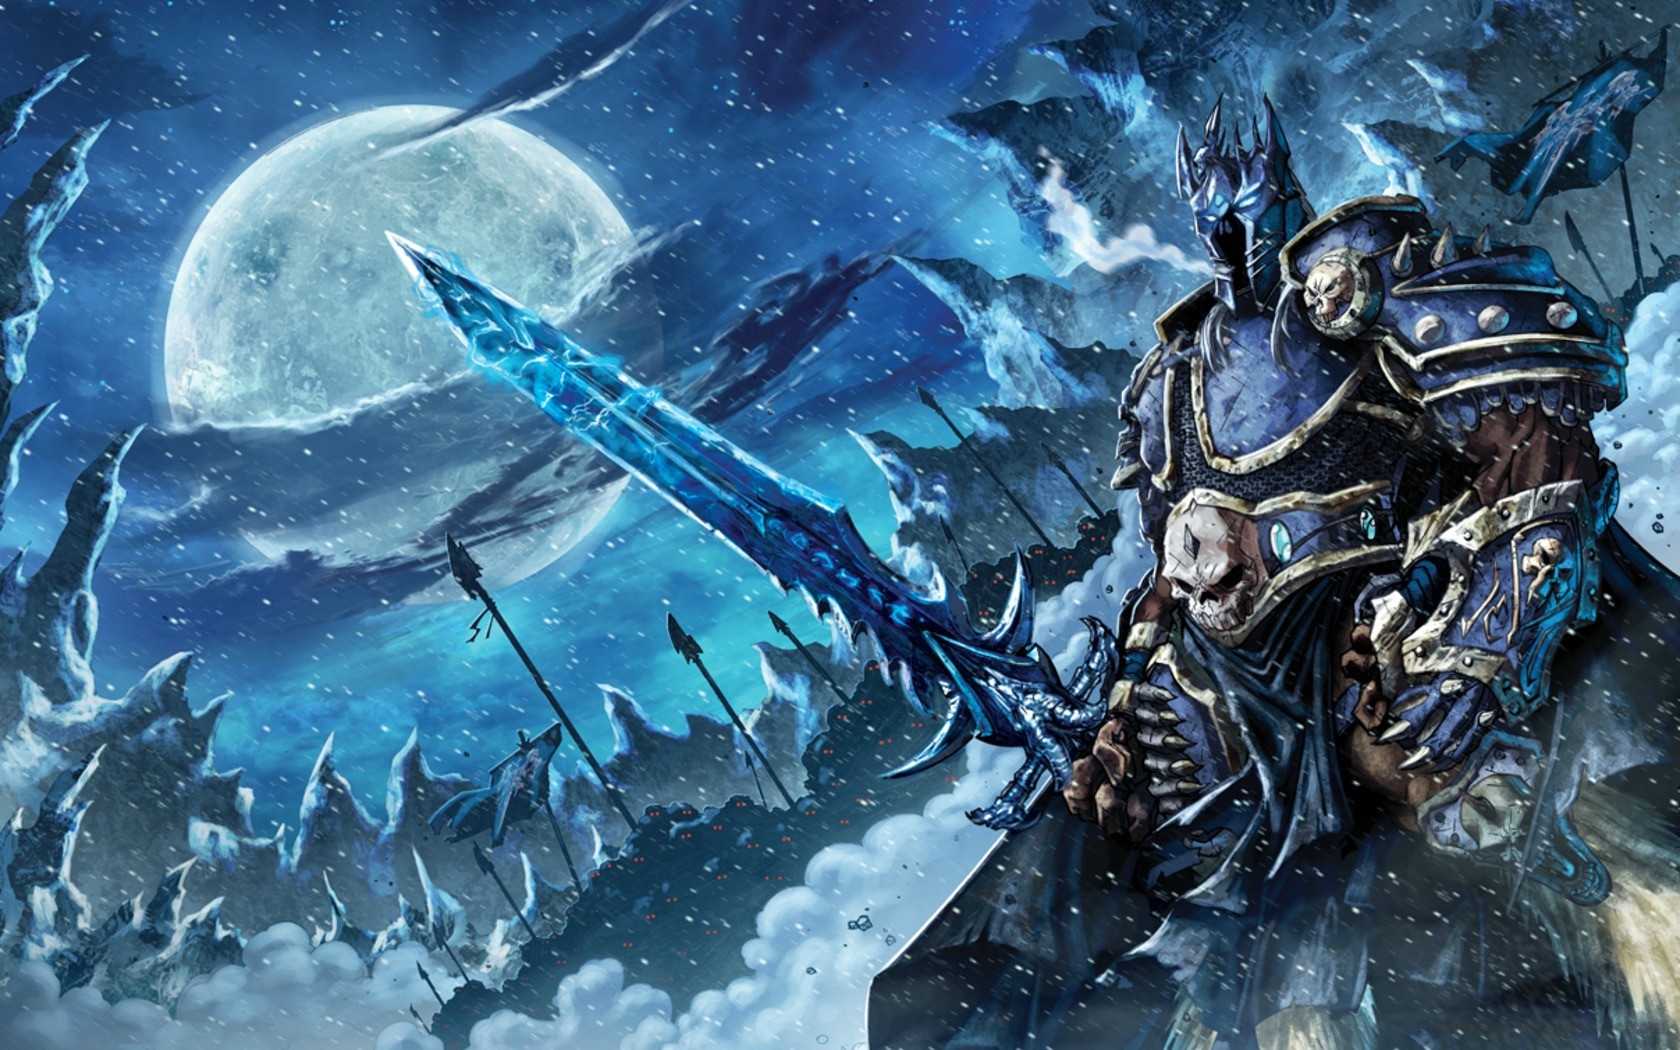 Warcraft Hd Wallpaper Pack 11 Free Download